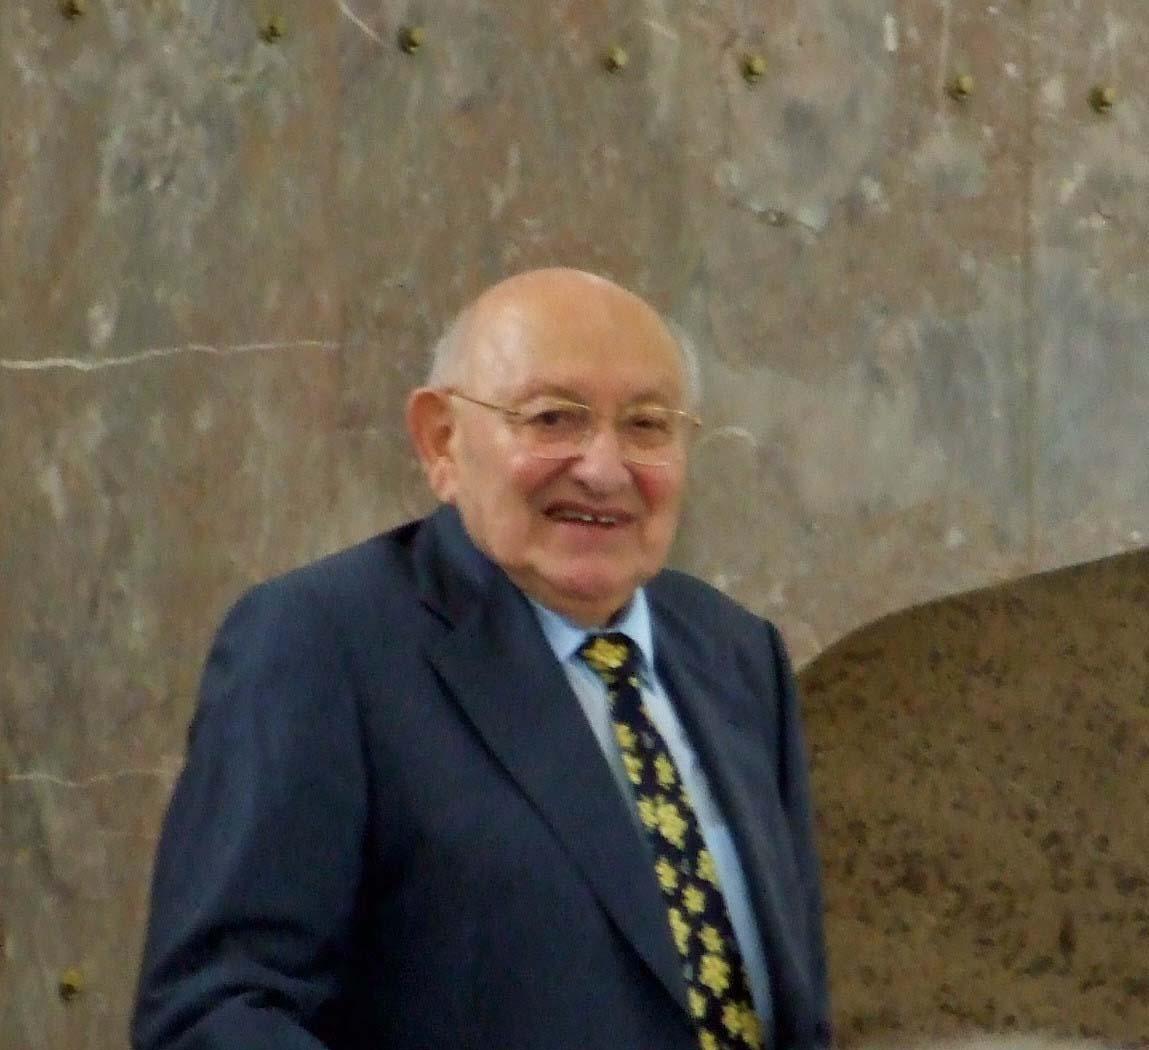 Marcel Reich-Ranicki, 2007. Kilde: Wikimedia Commons